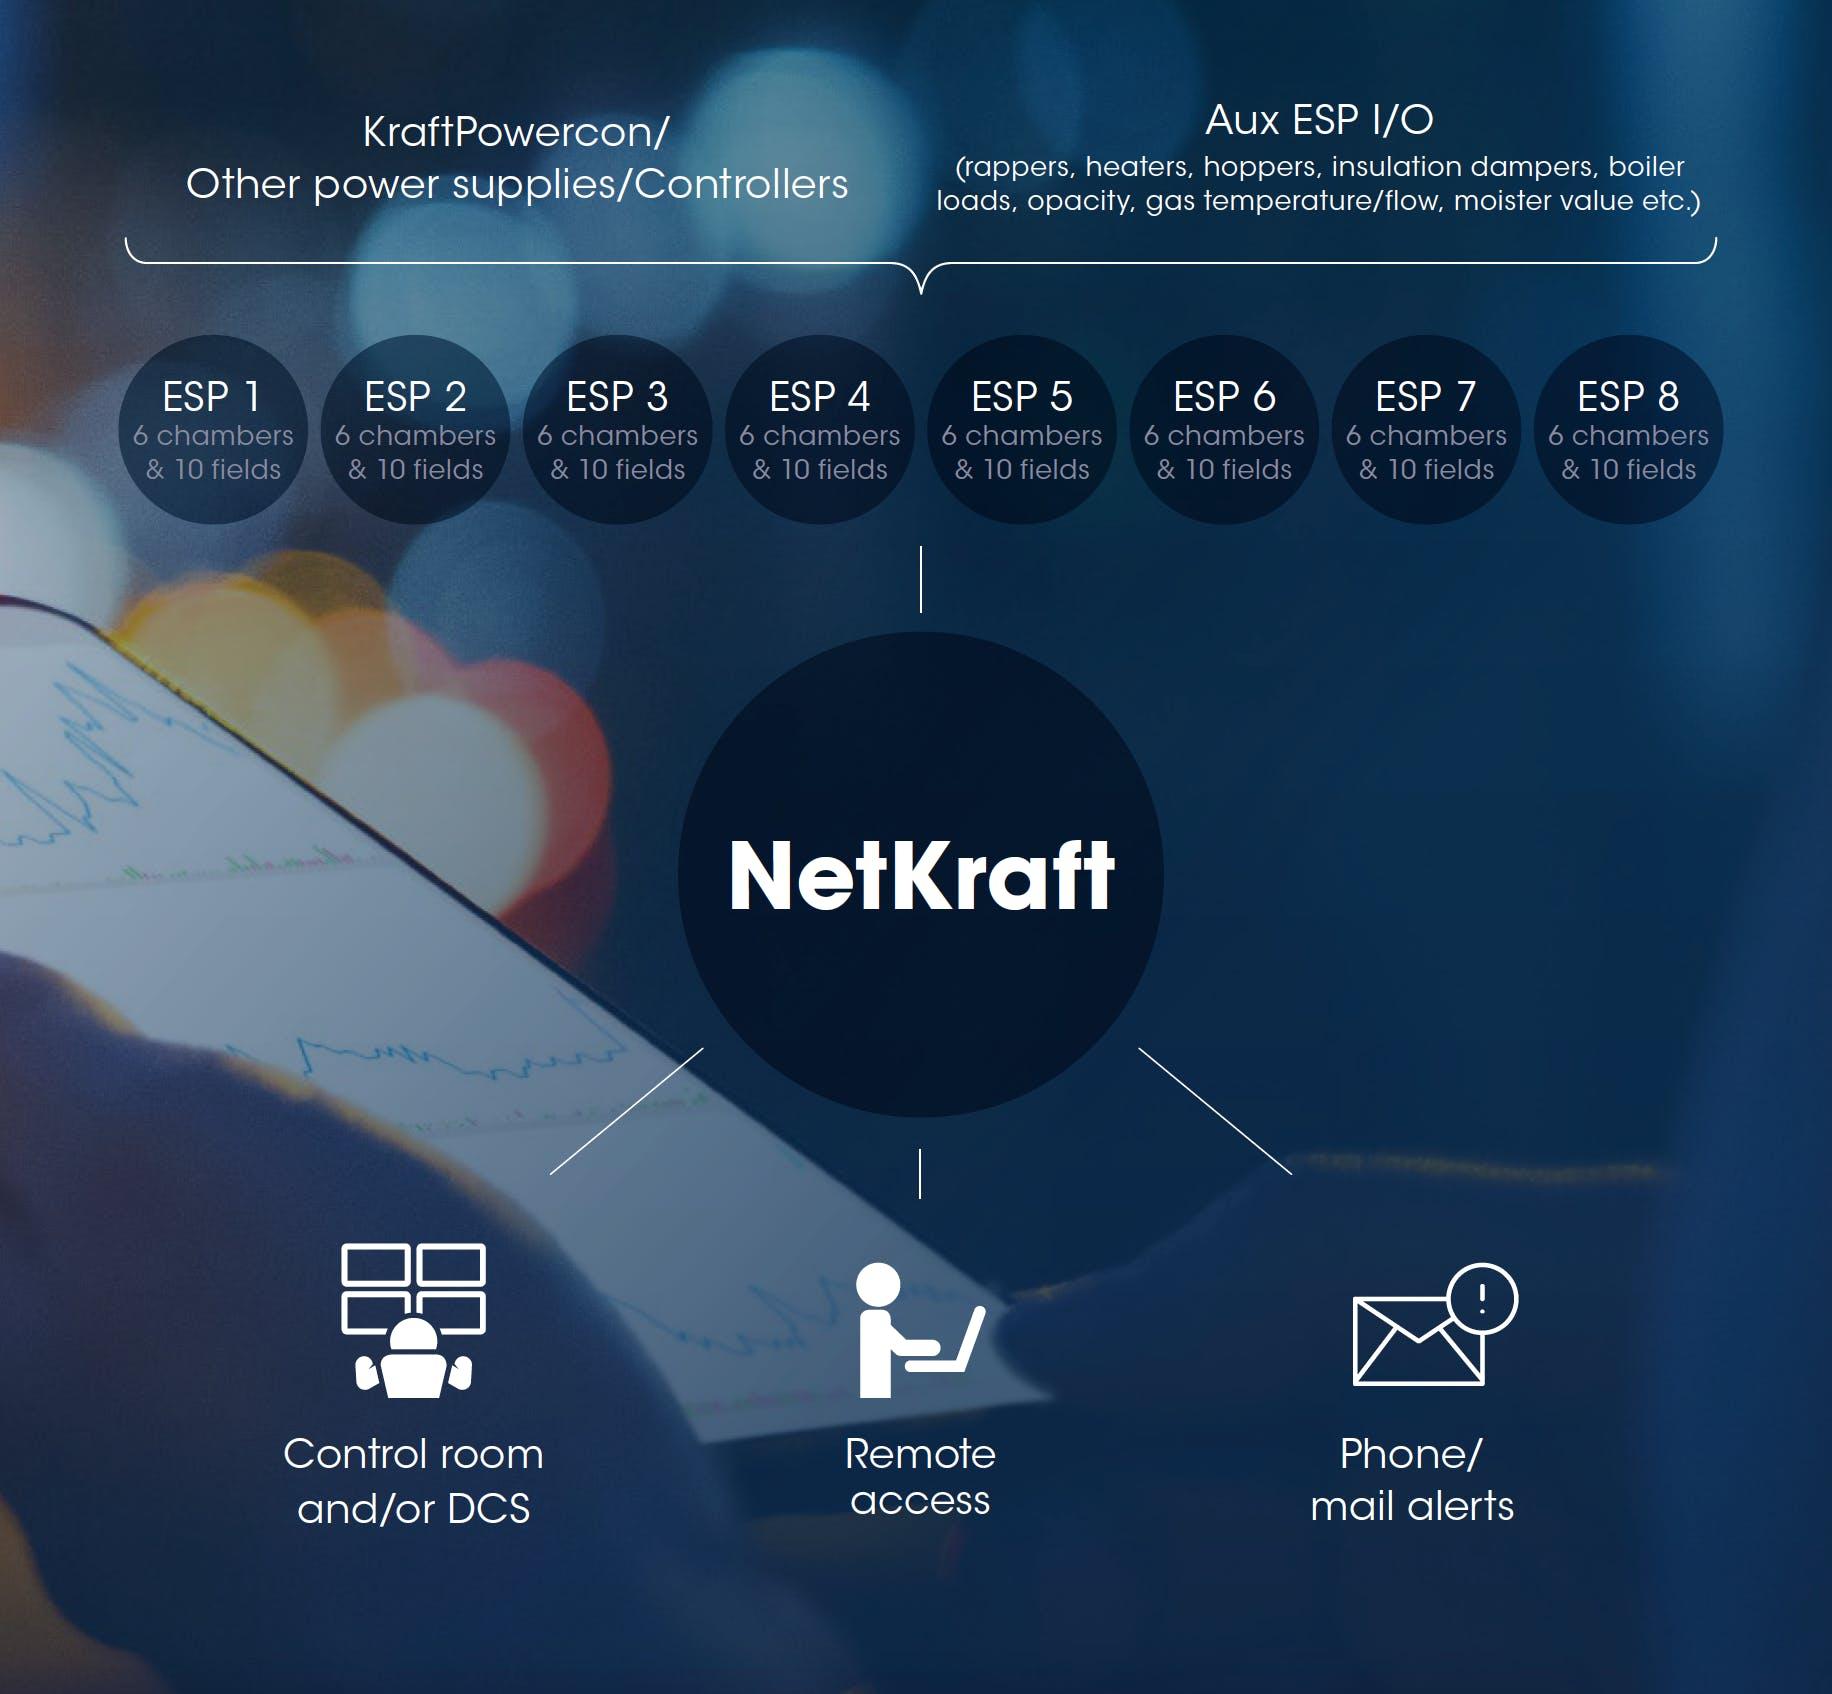 NetKraft